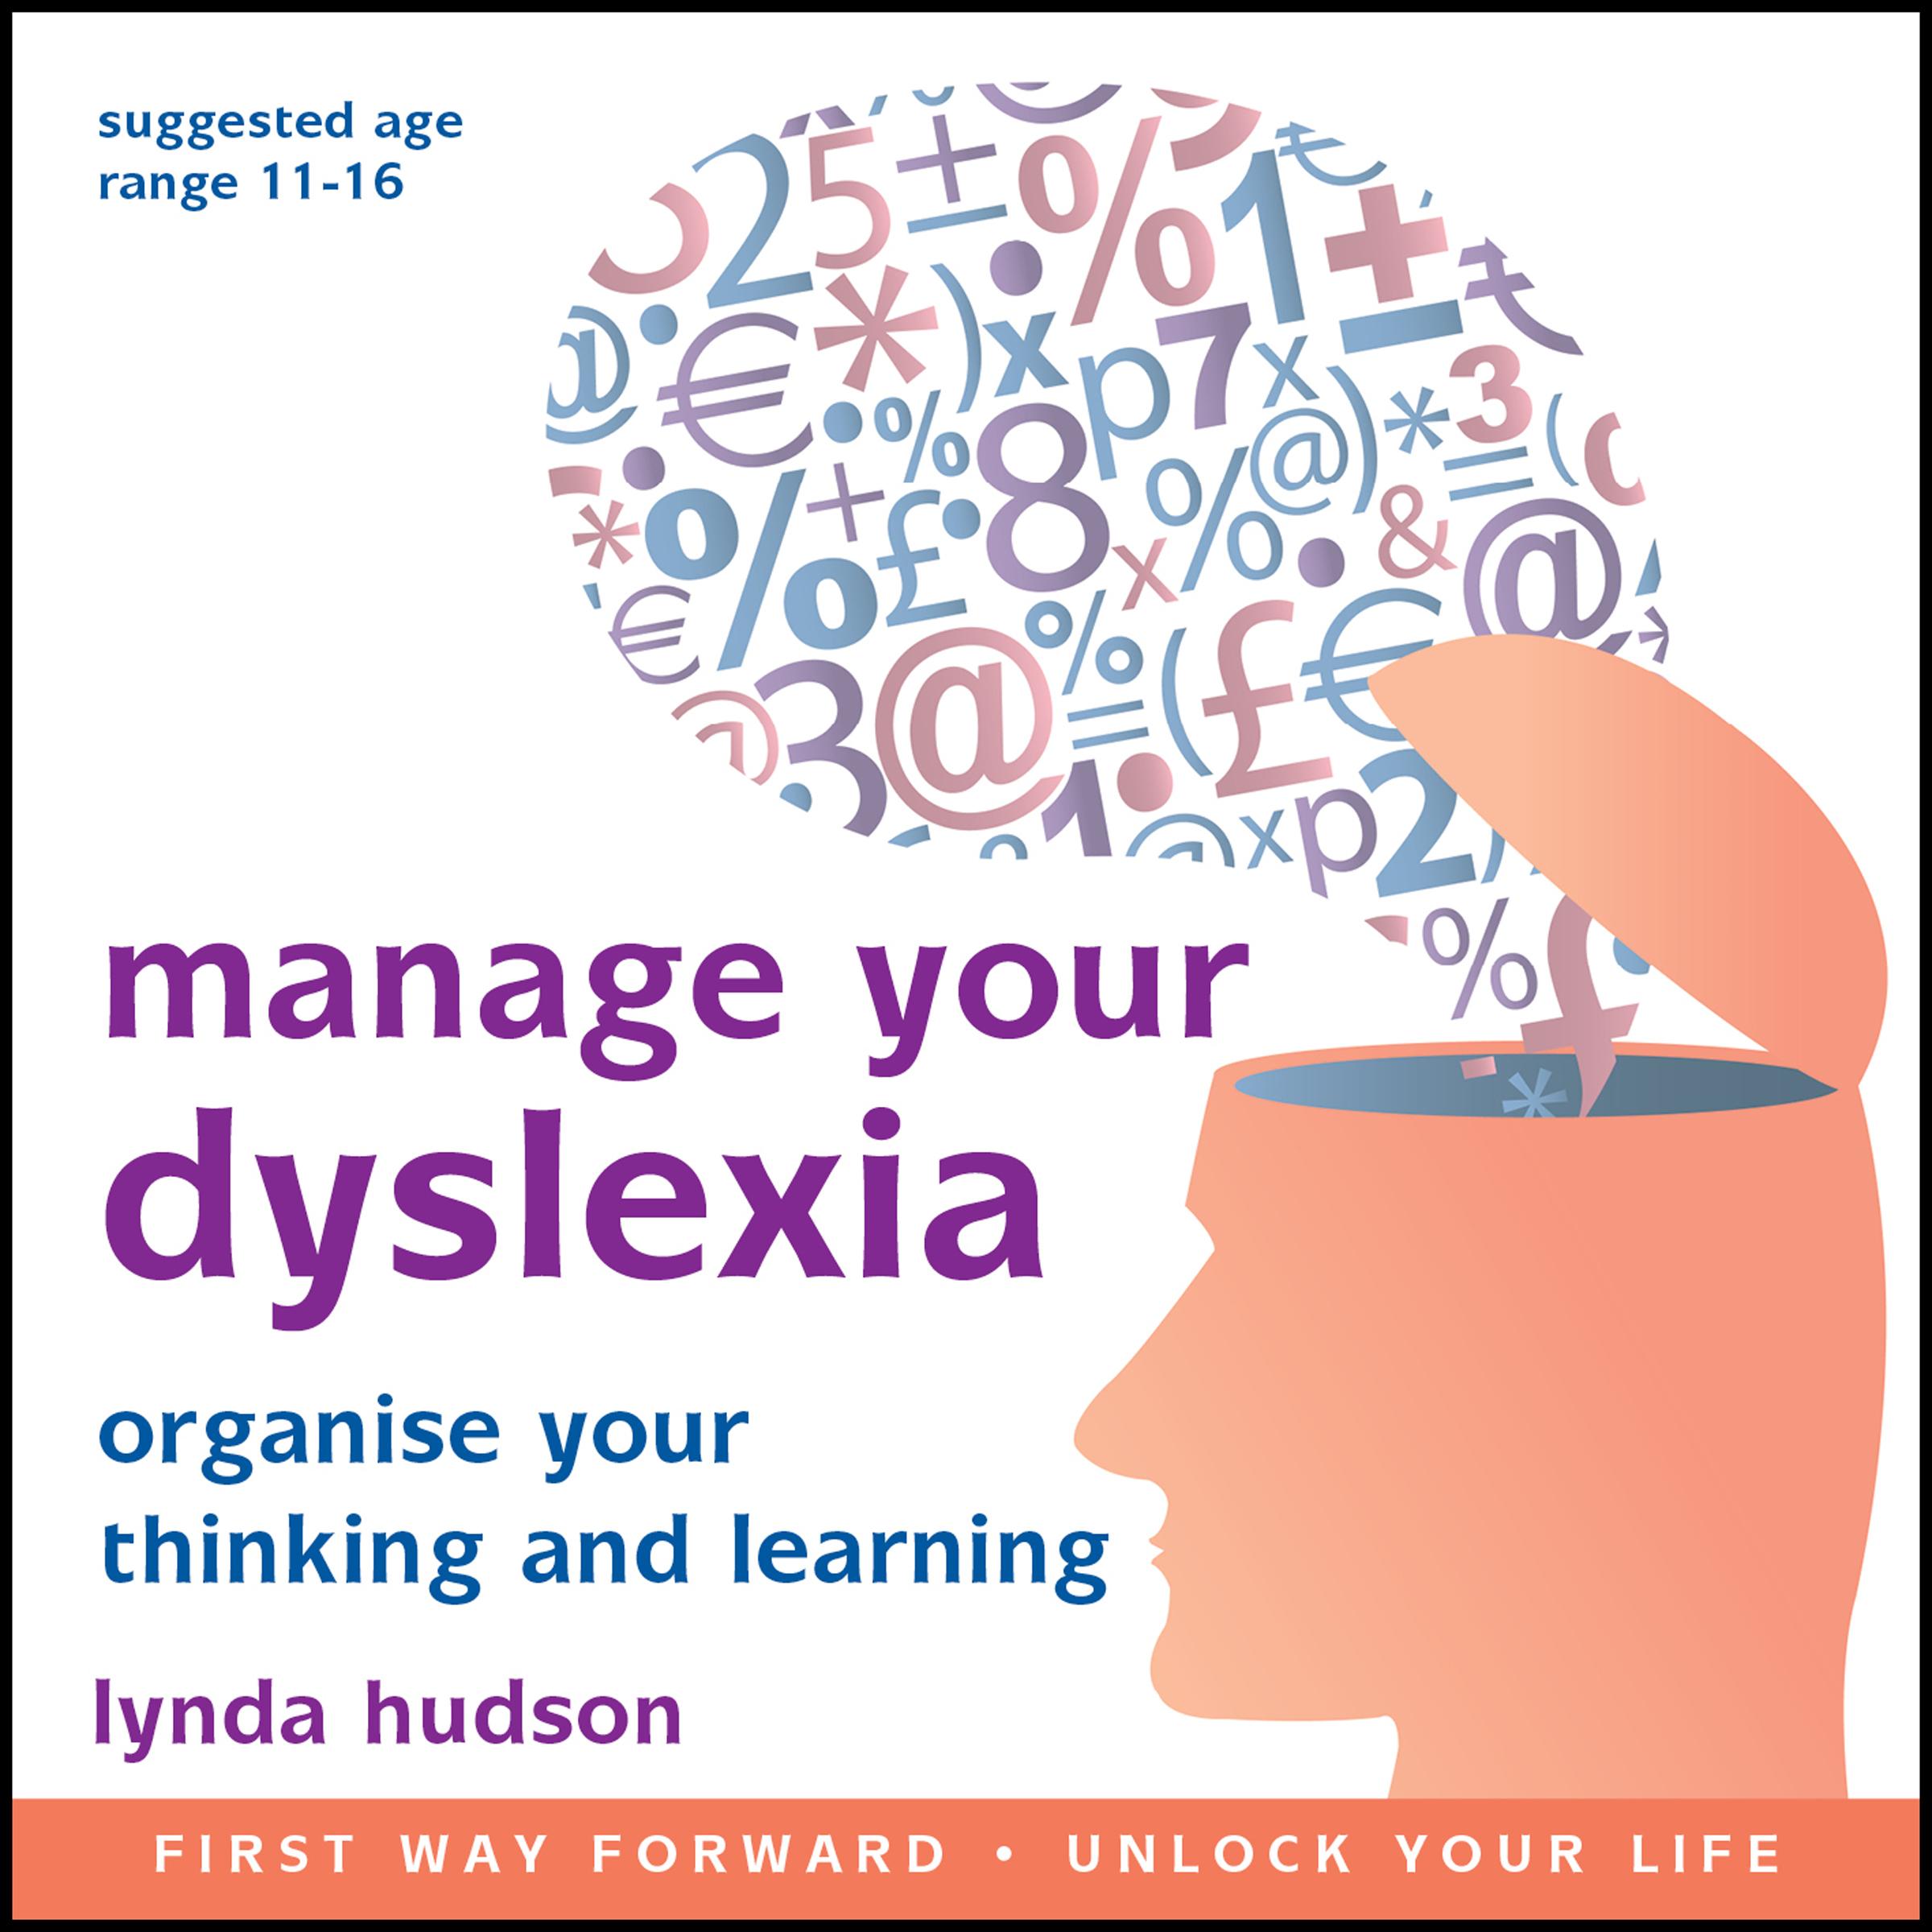 Manage your dyslexia